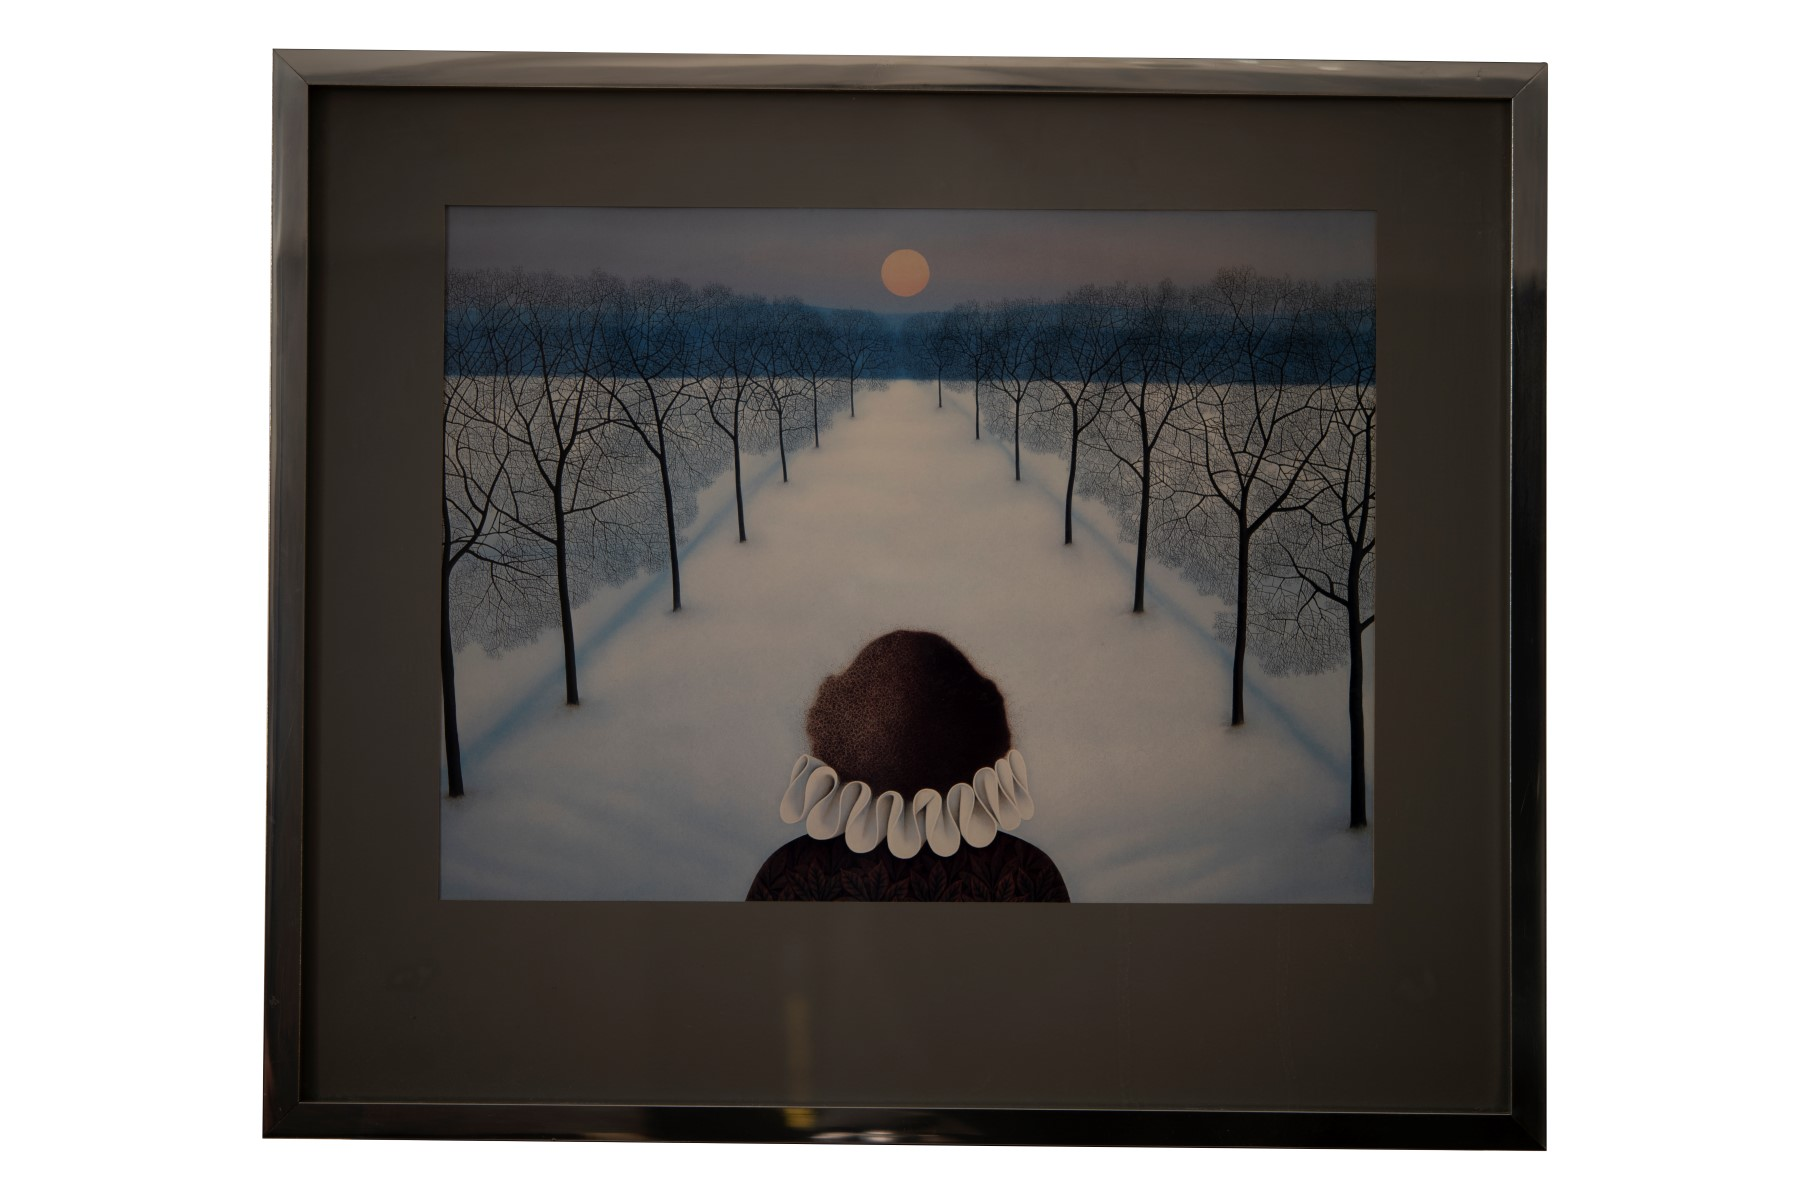 #119 Josef Bramer* (1948), View into the Distance   Josef Bramer* (1948), Blick in die Ferne Image